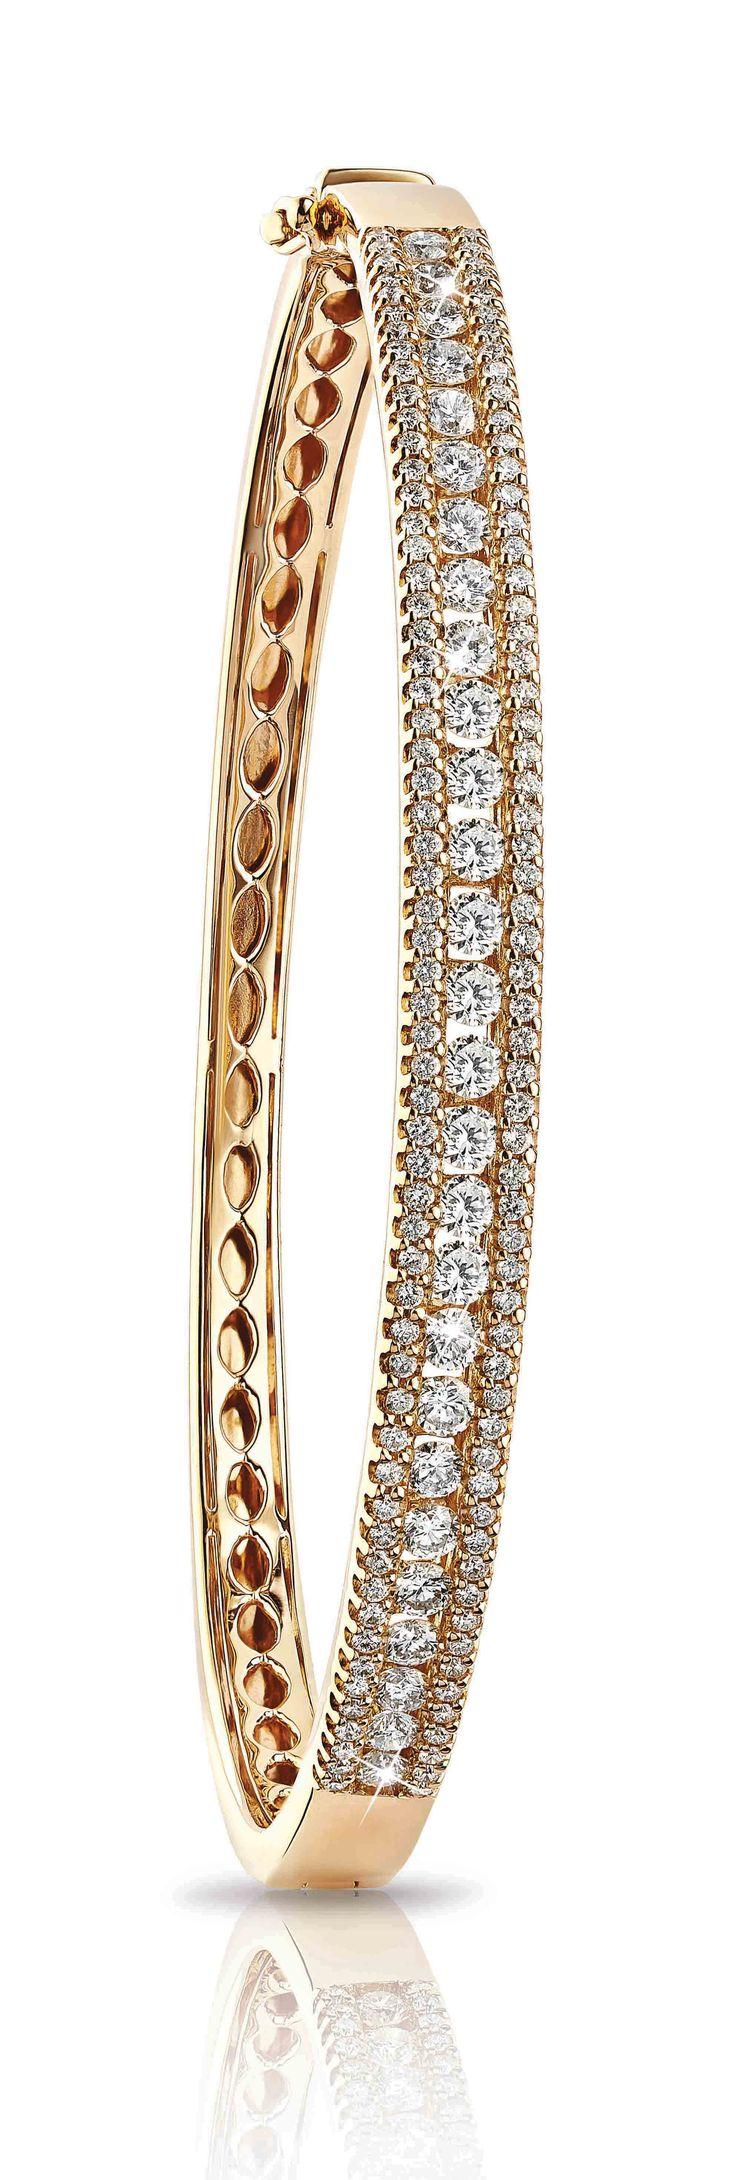 Rosamaria G Frangini   High Diamond Jewellery  